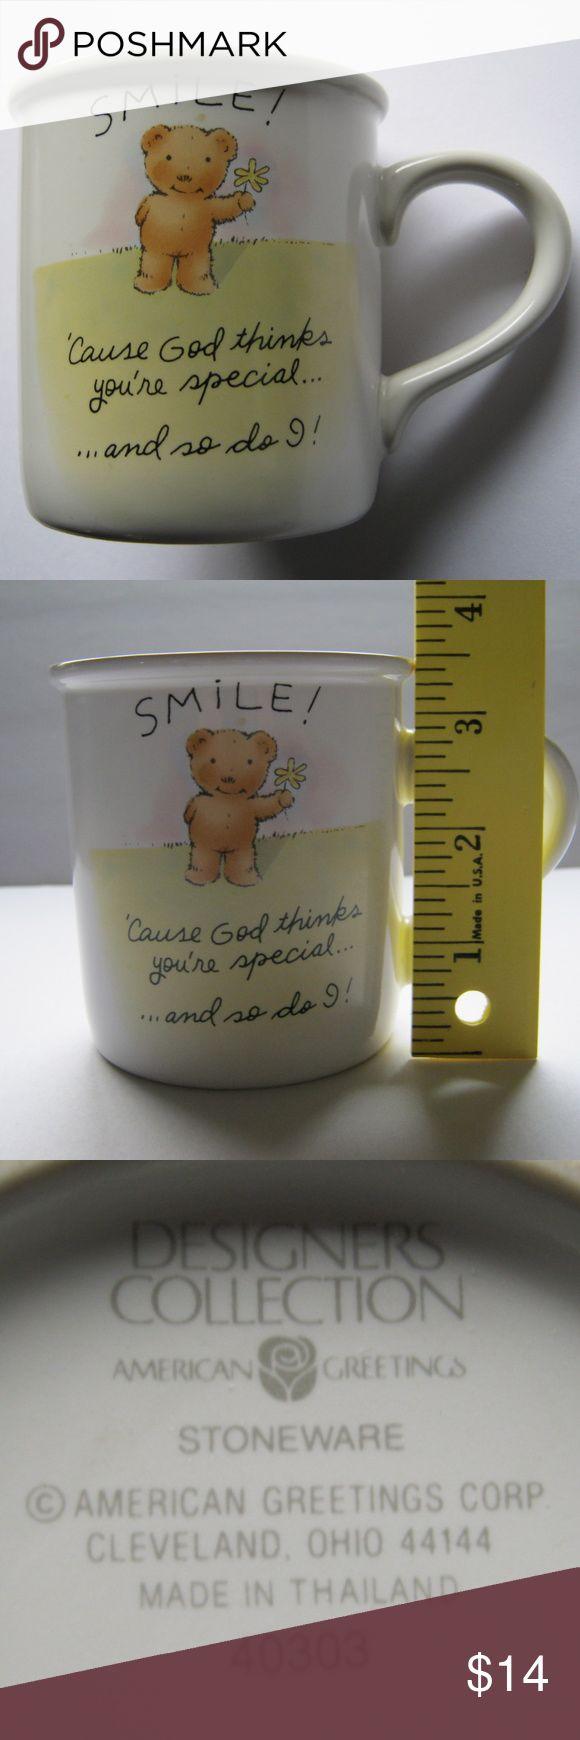 American greetings 1 mom coffee cup mug by shoppinglounge on etsy american greetings 1 mom coffee cup mug by shoppinglounge on etsy everything for sale pinterest american greetings coffee cup and cups m4hsunfo